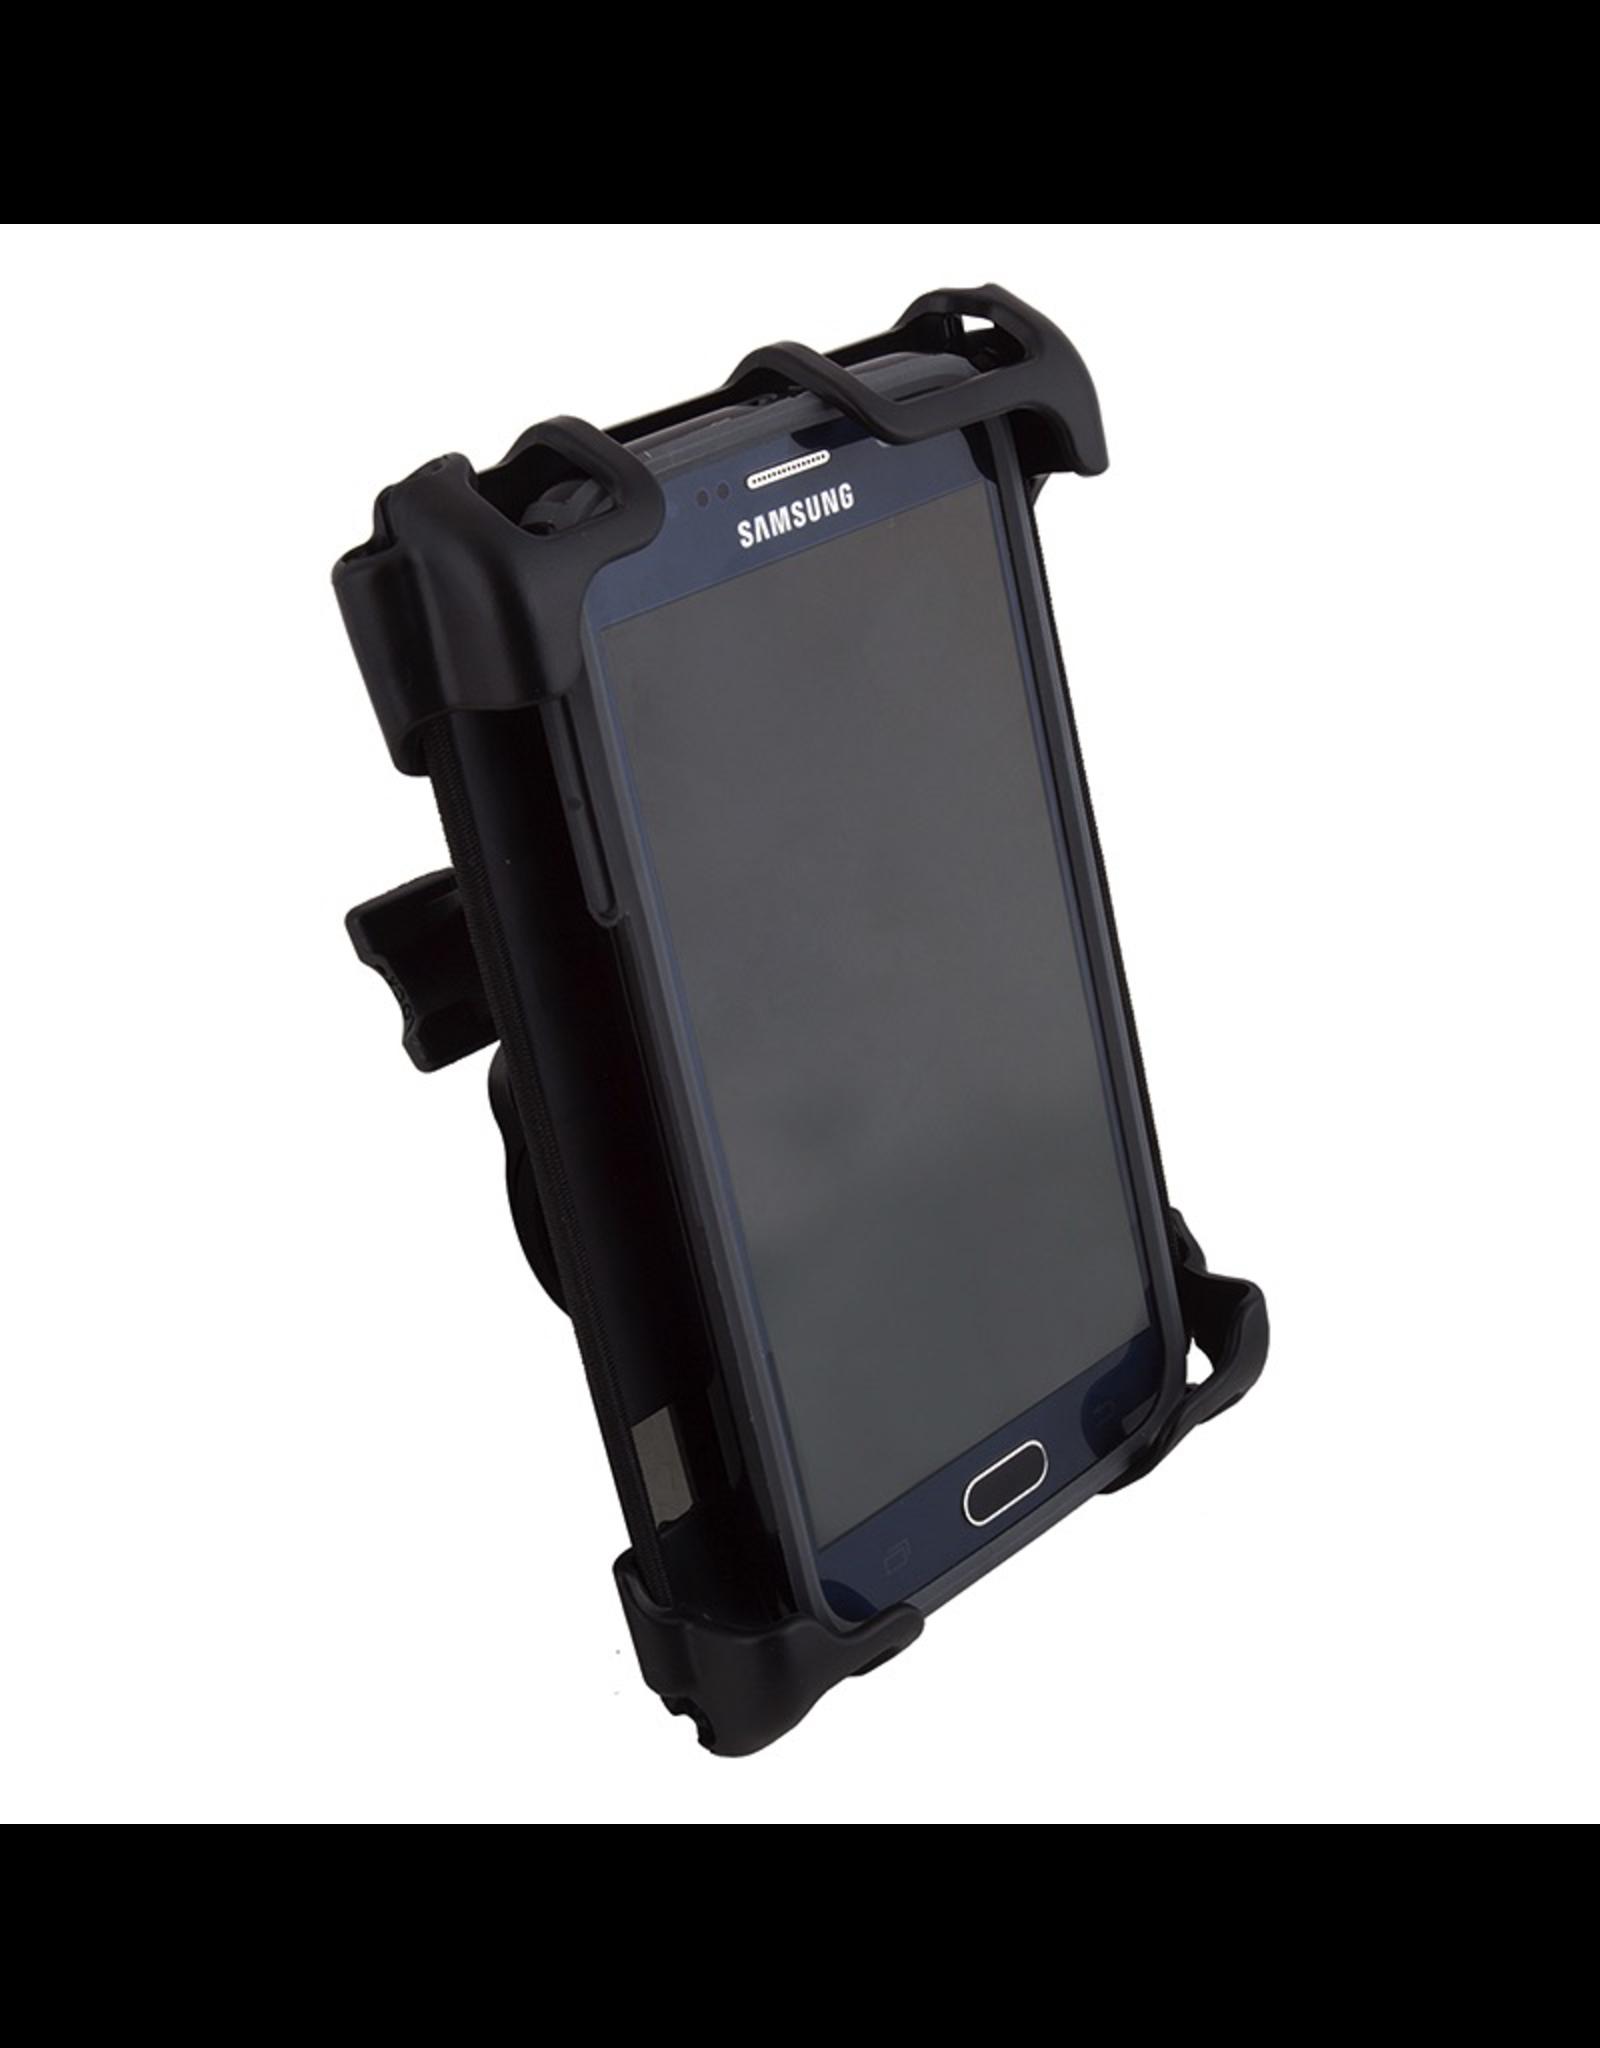 Delta Delta Handlebar Phone Holder - Hefty+, Black